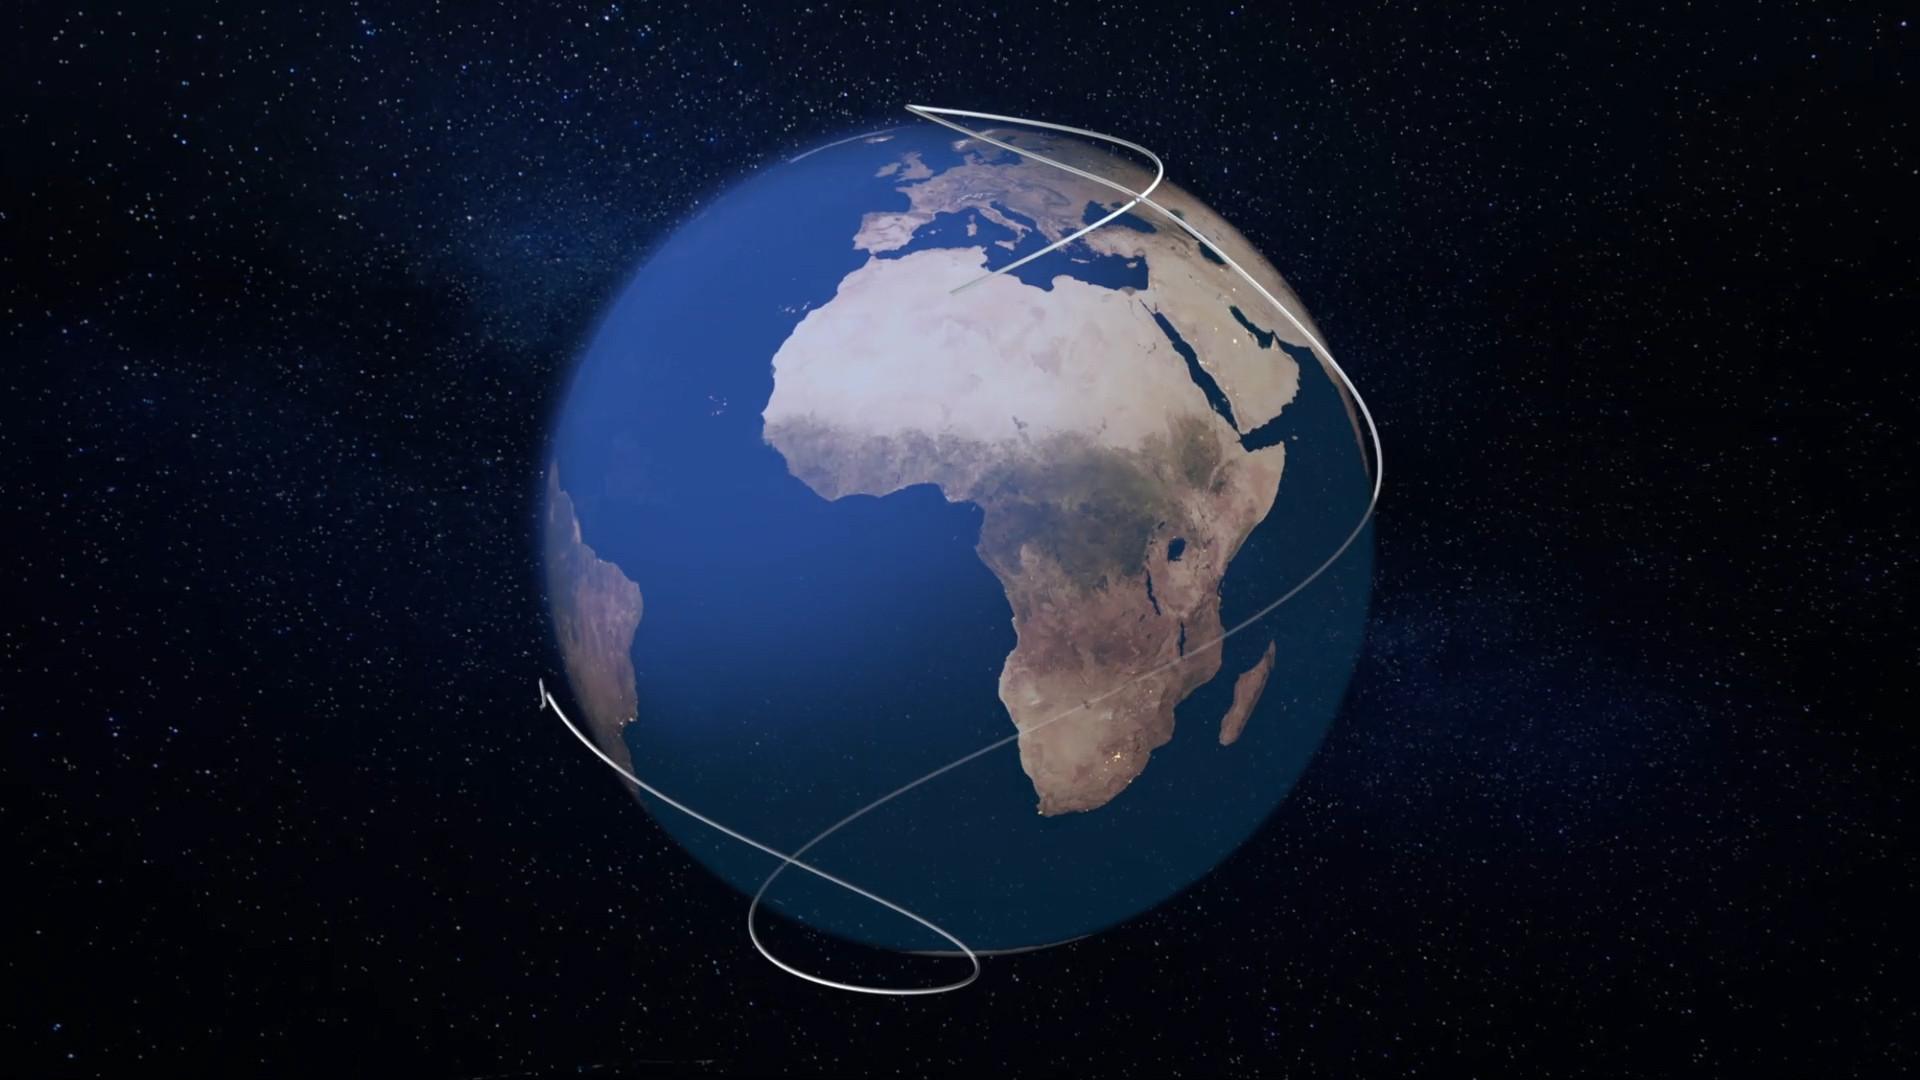 05. One More Orbit Flight Path